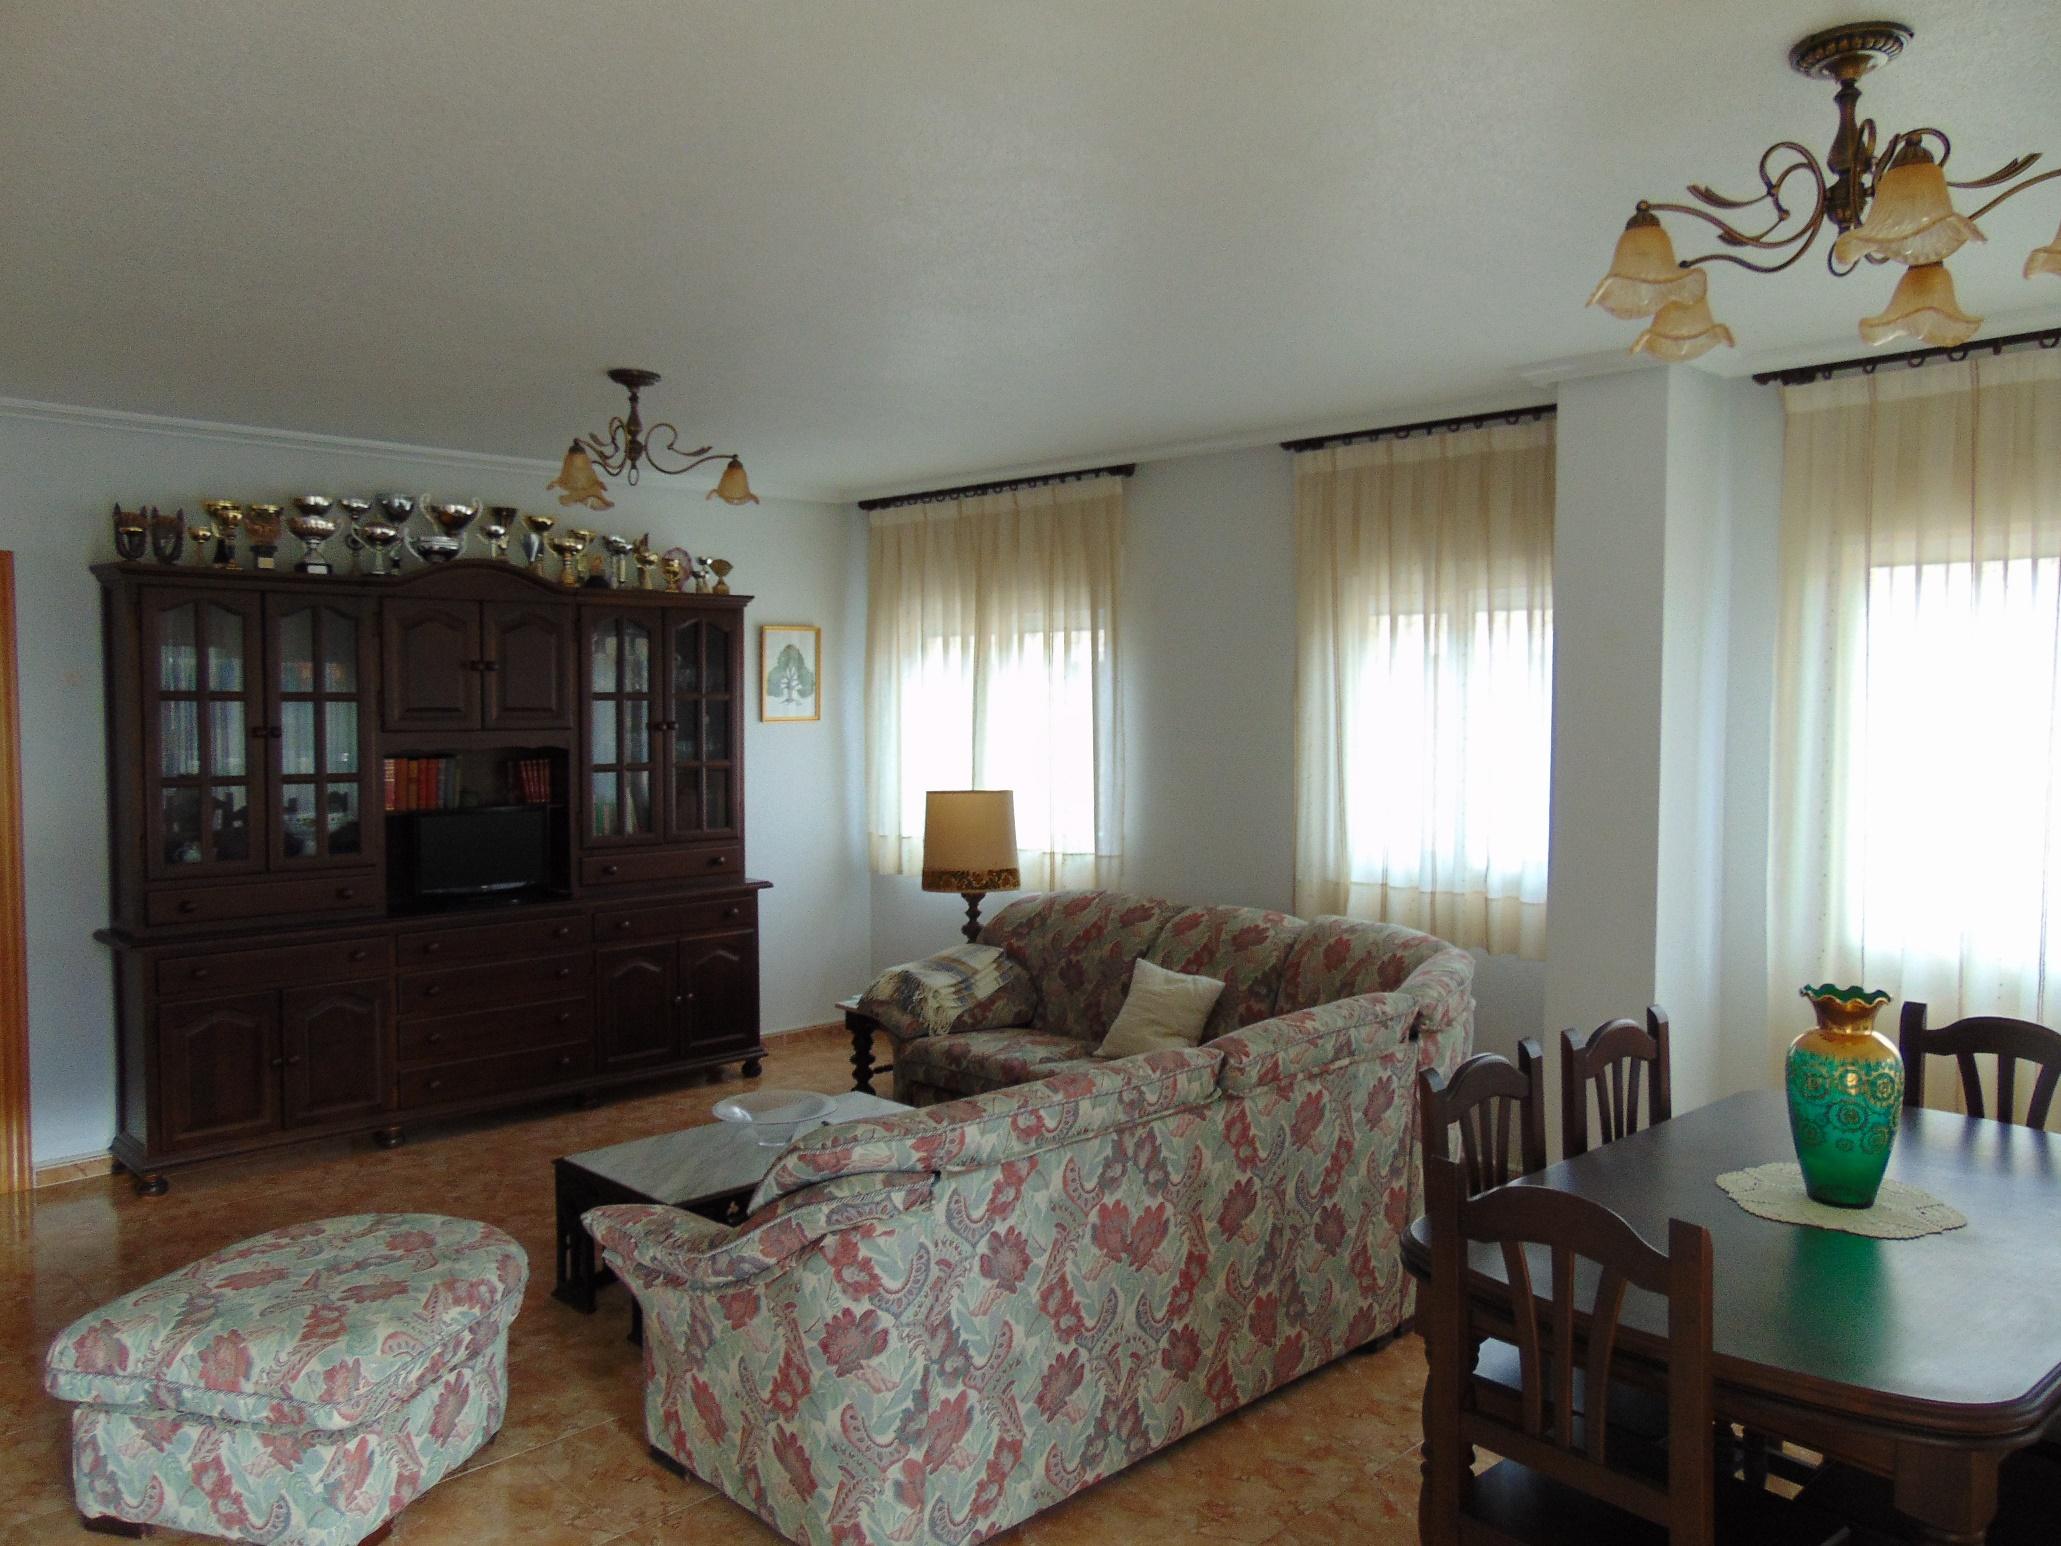 Propery For Sale in San Pedro del Pinatar, Spain image 6